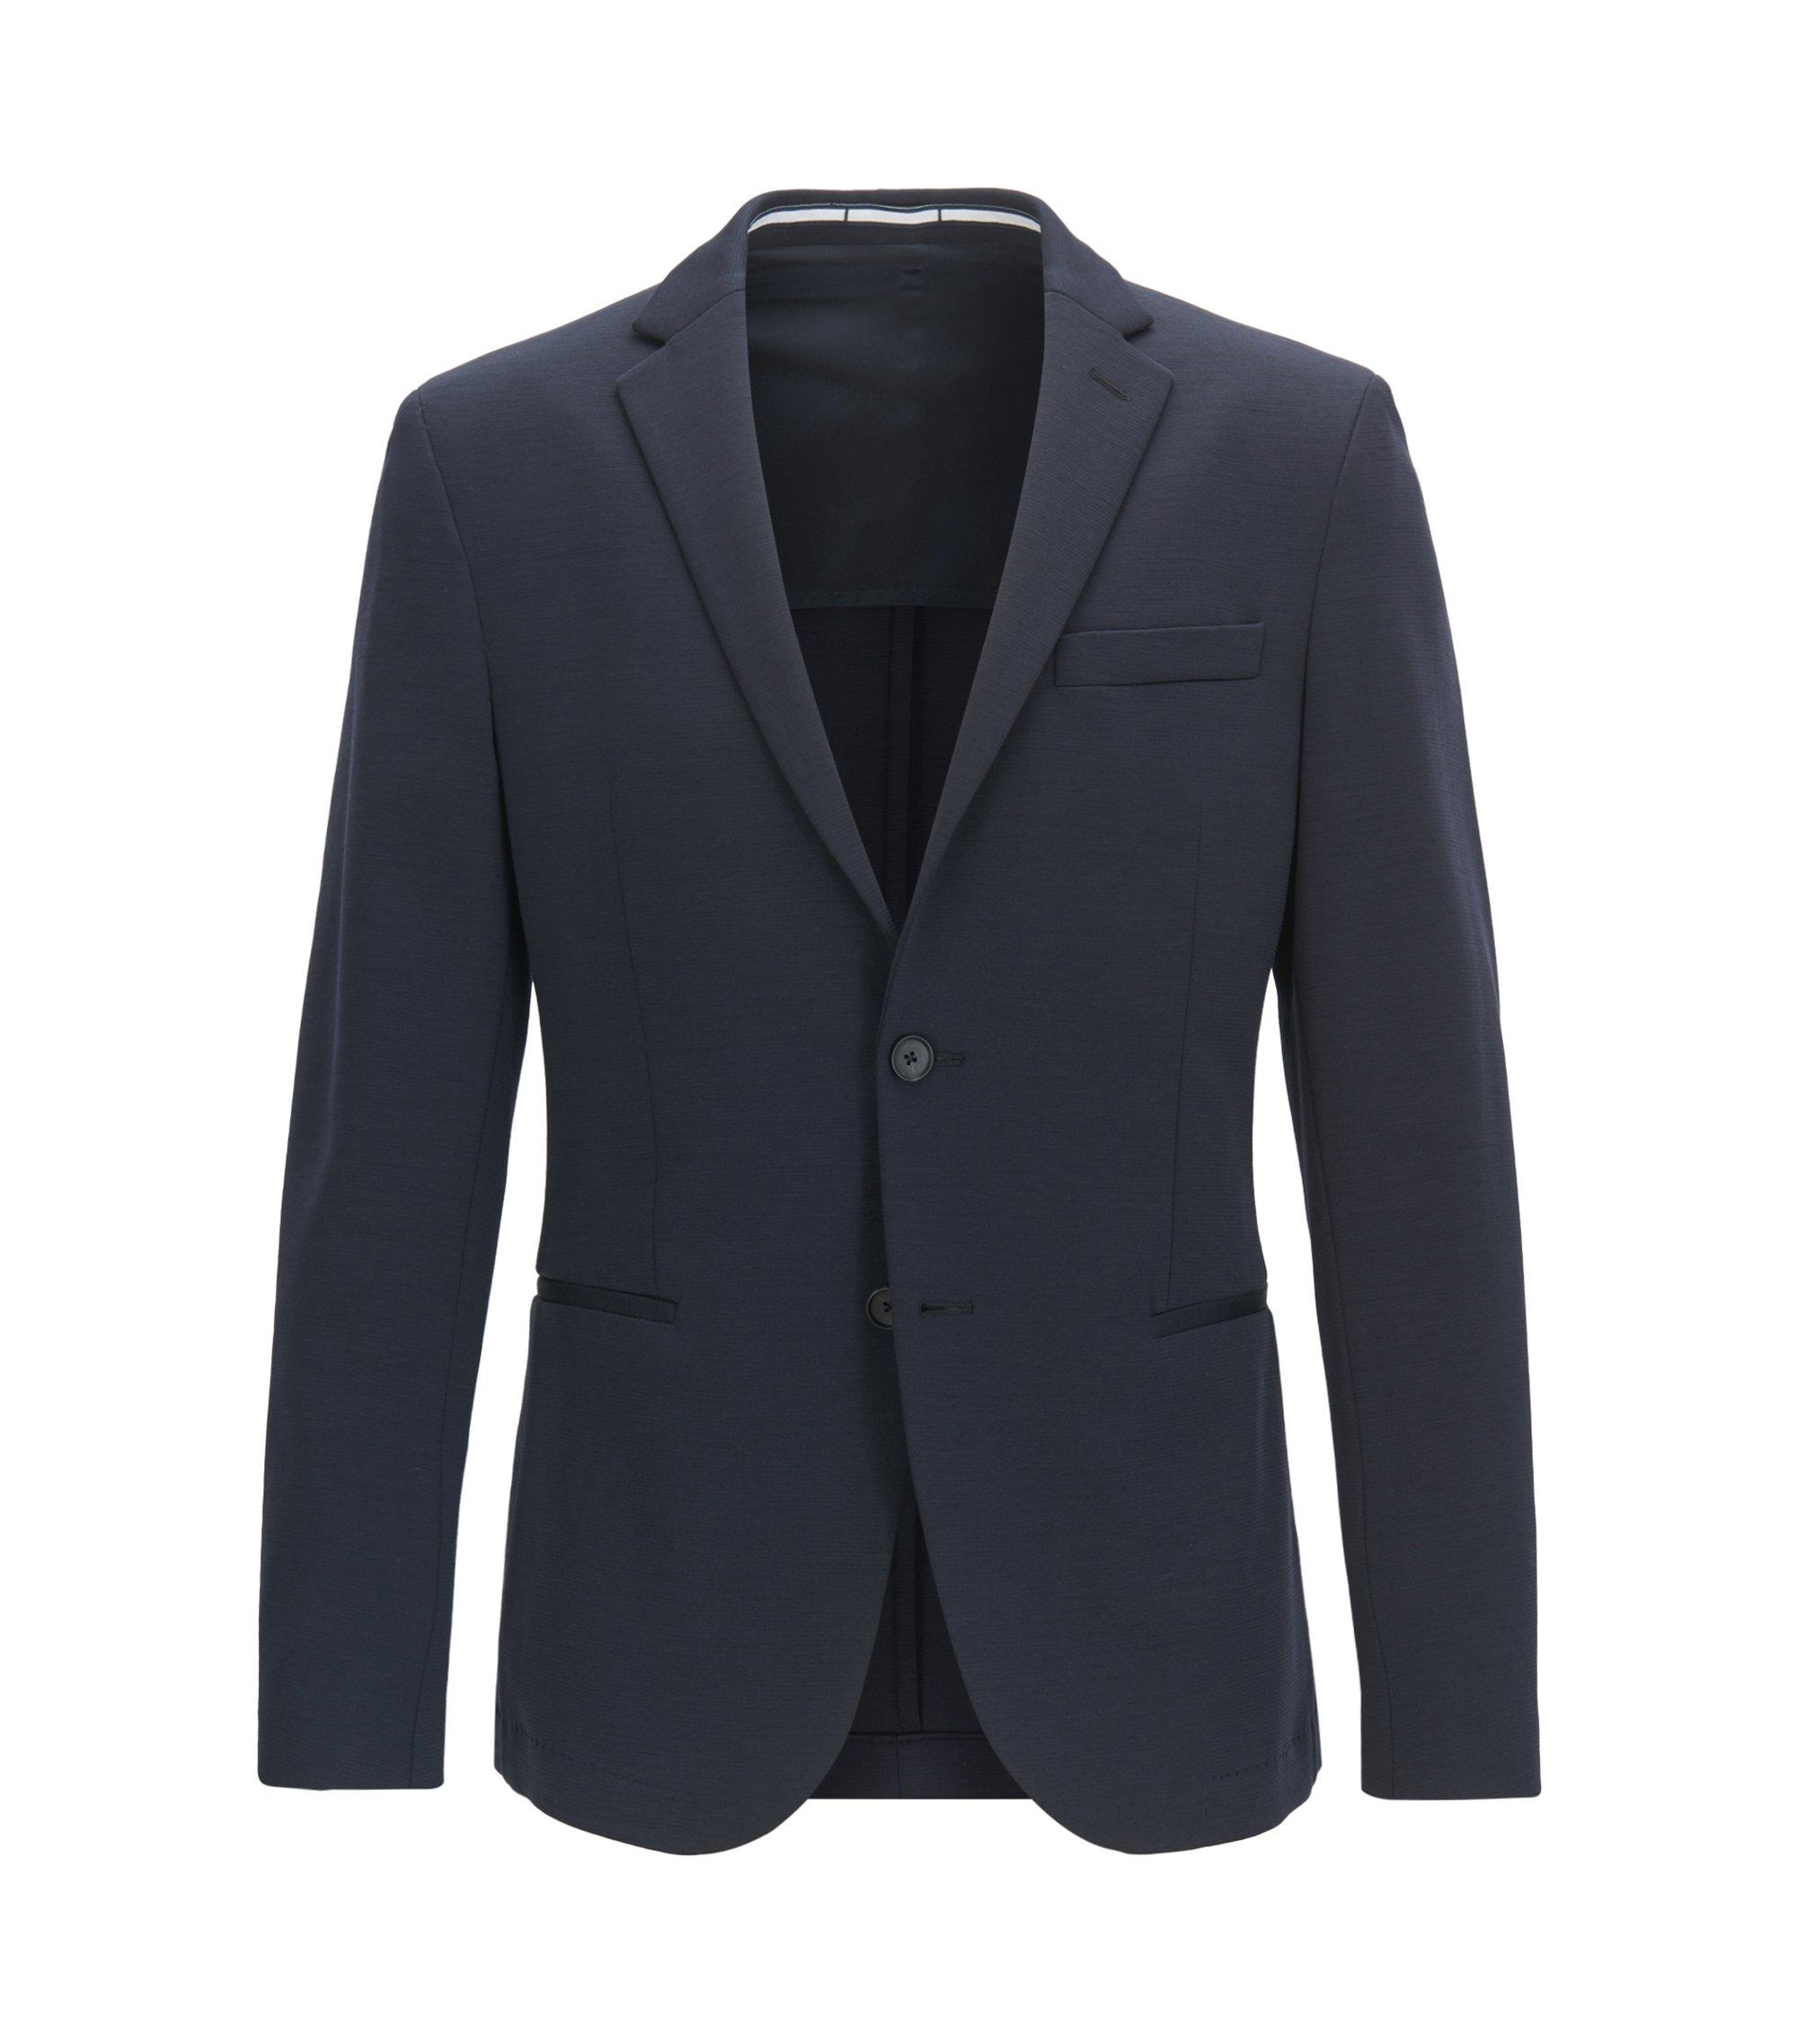 Stretch Wool Blend Sport Coat, Slim Fit | Norwin J, Dark Blue